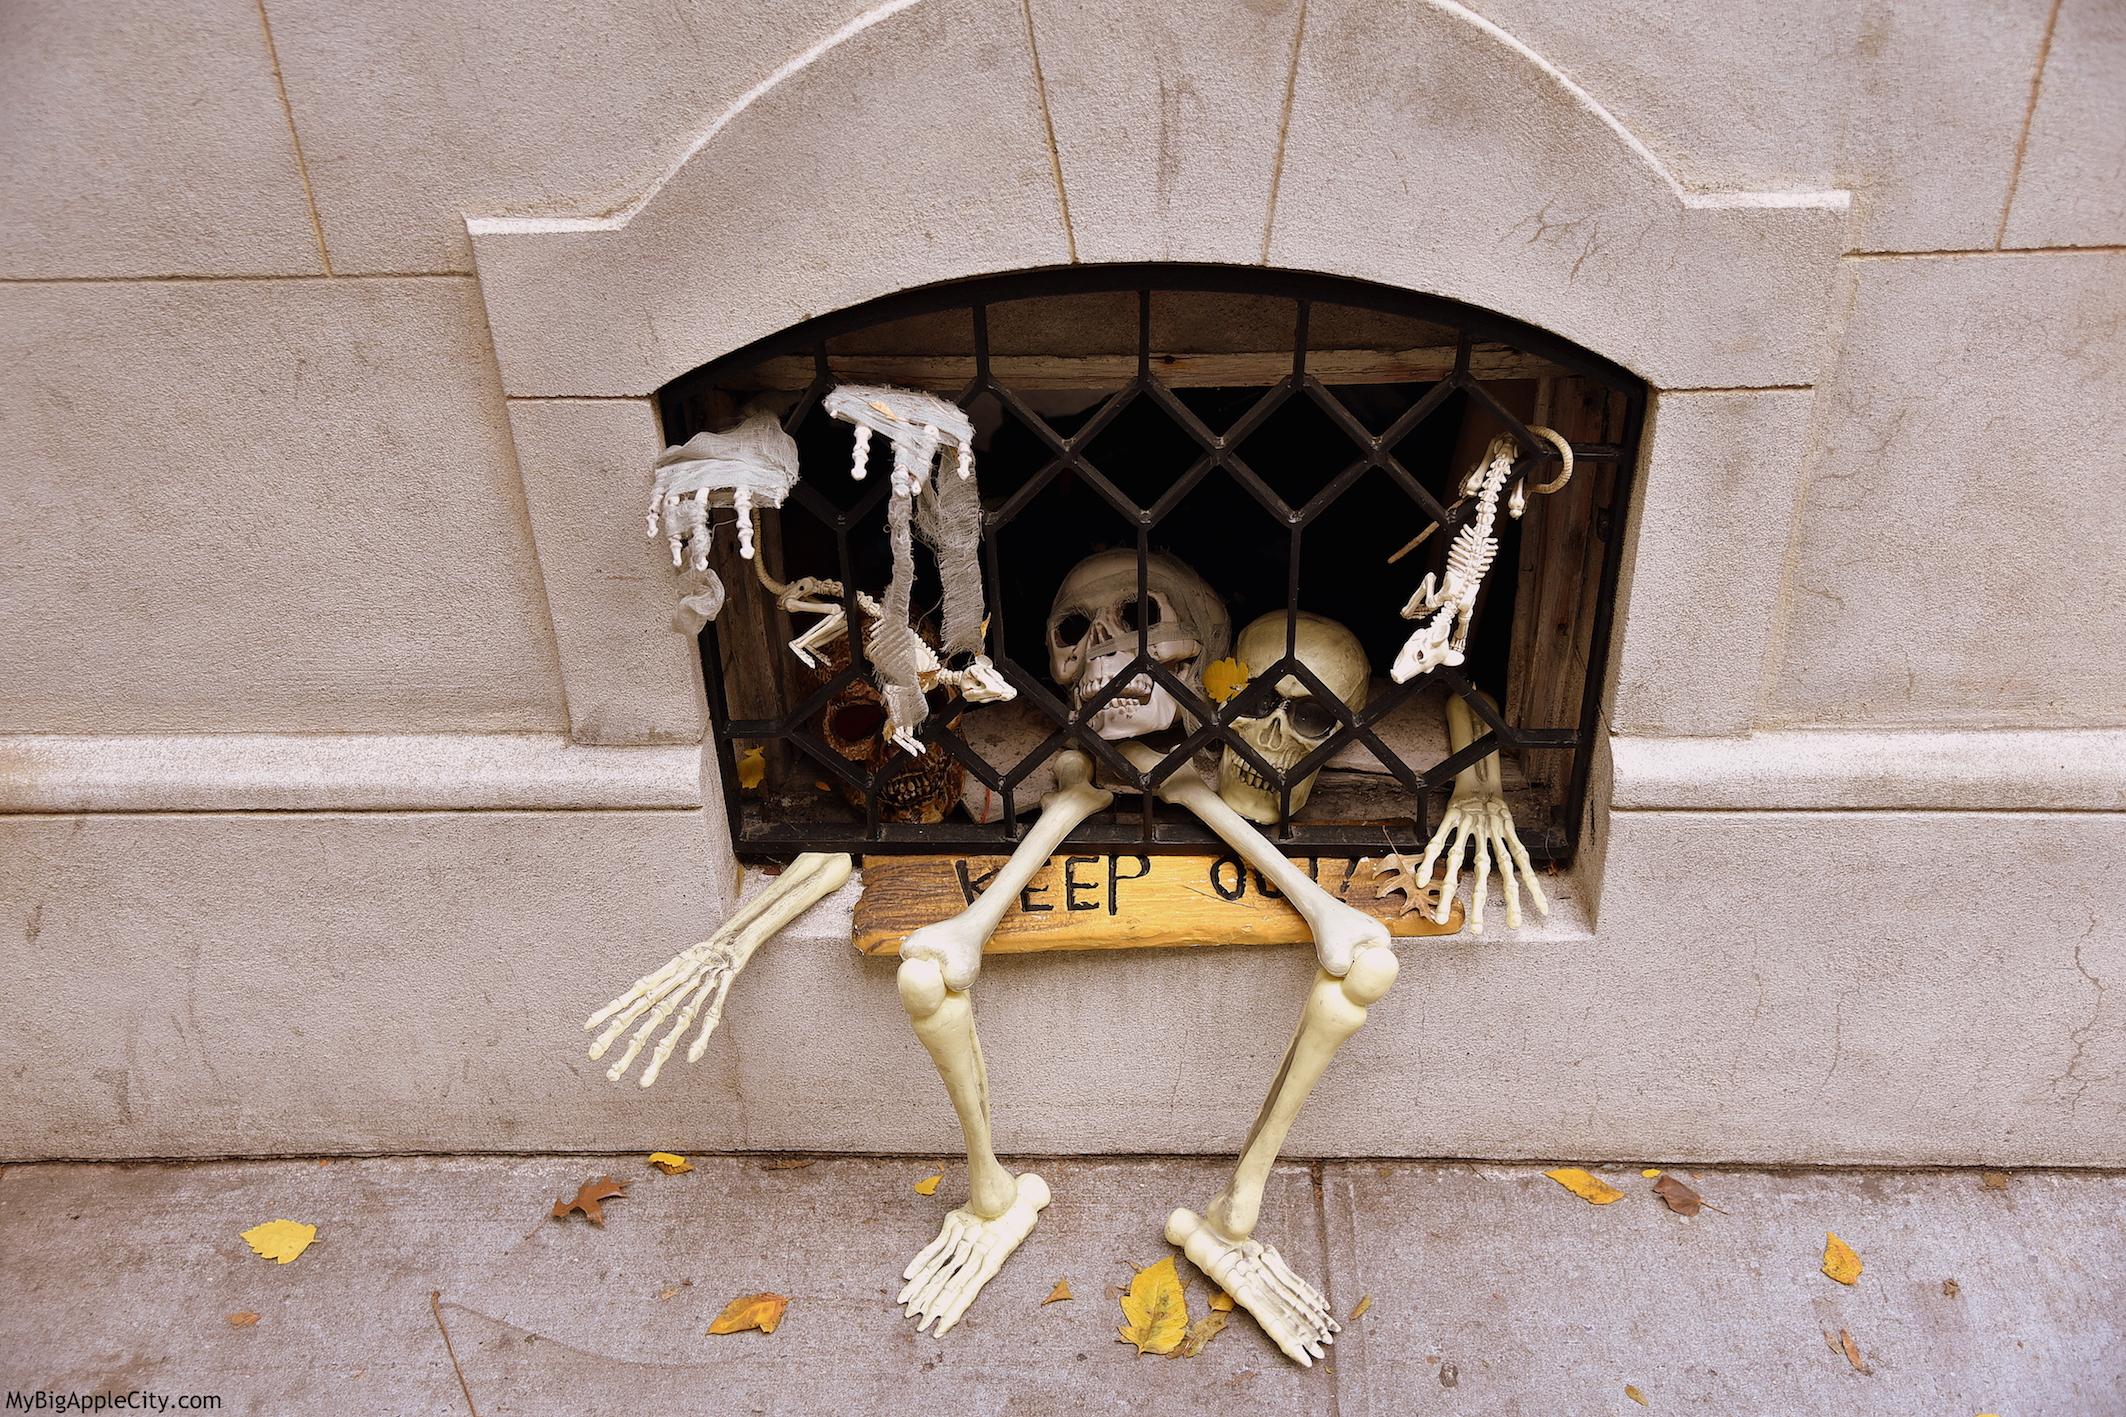 Halloween-NYC-skeleton-houses-travelblog-MyBigAppleCity